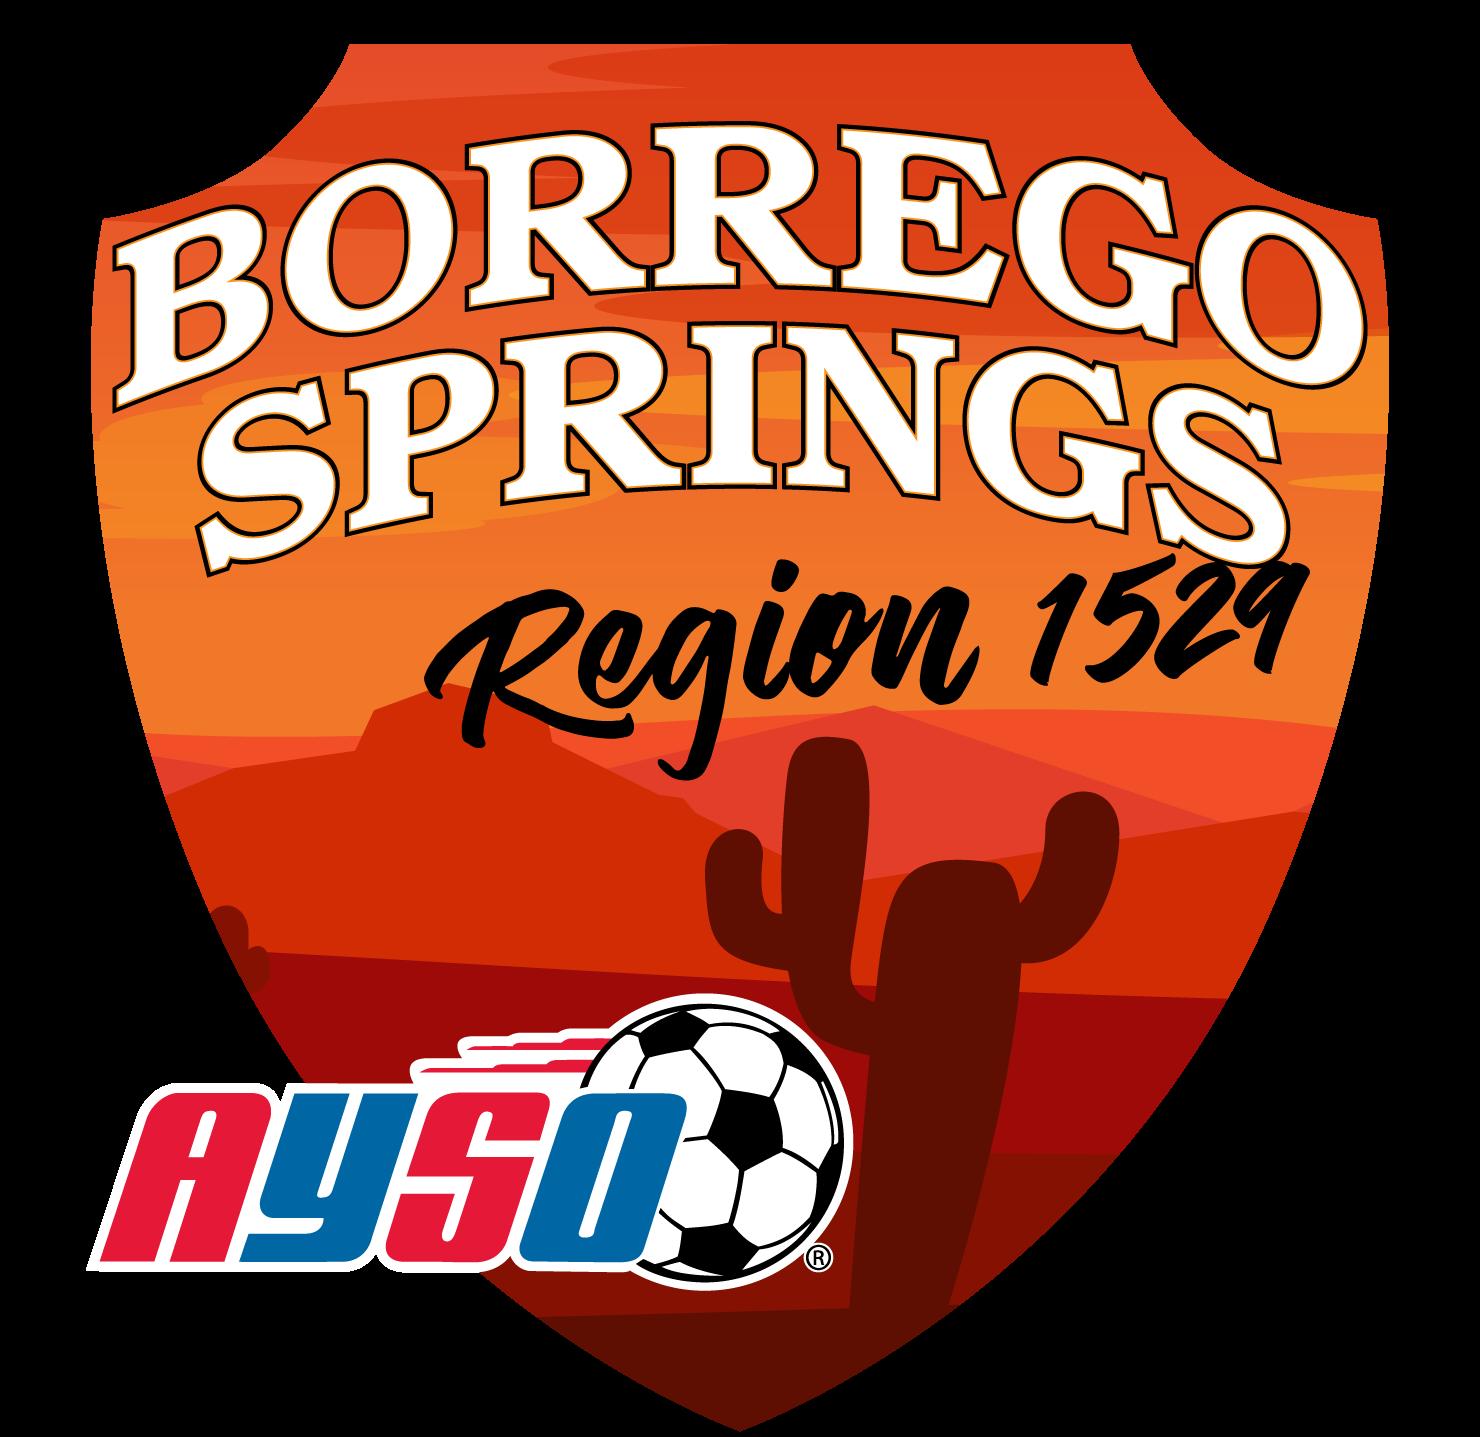 BORREGO SPRINGS - REGION 1529